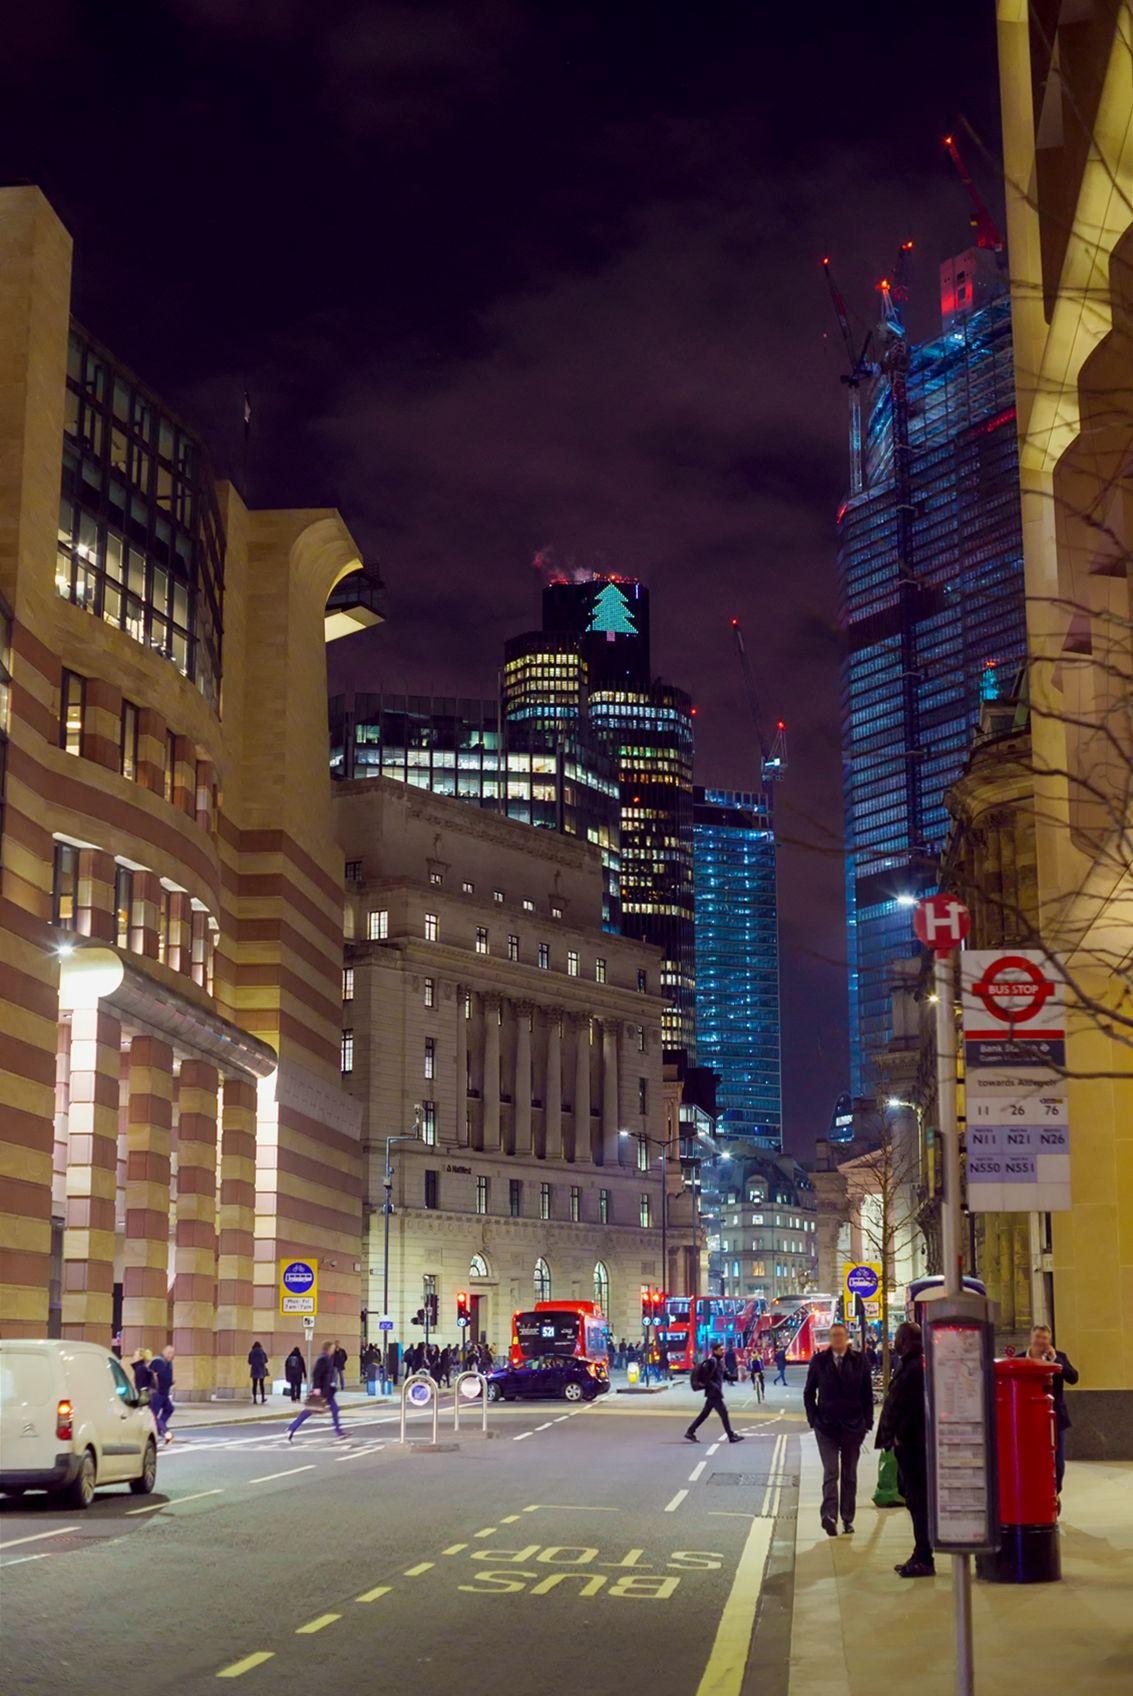 Queen Victoria Street At Night London Uk Oc 1113 X 1696 London England Photography London City Night London Skyline